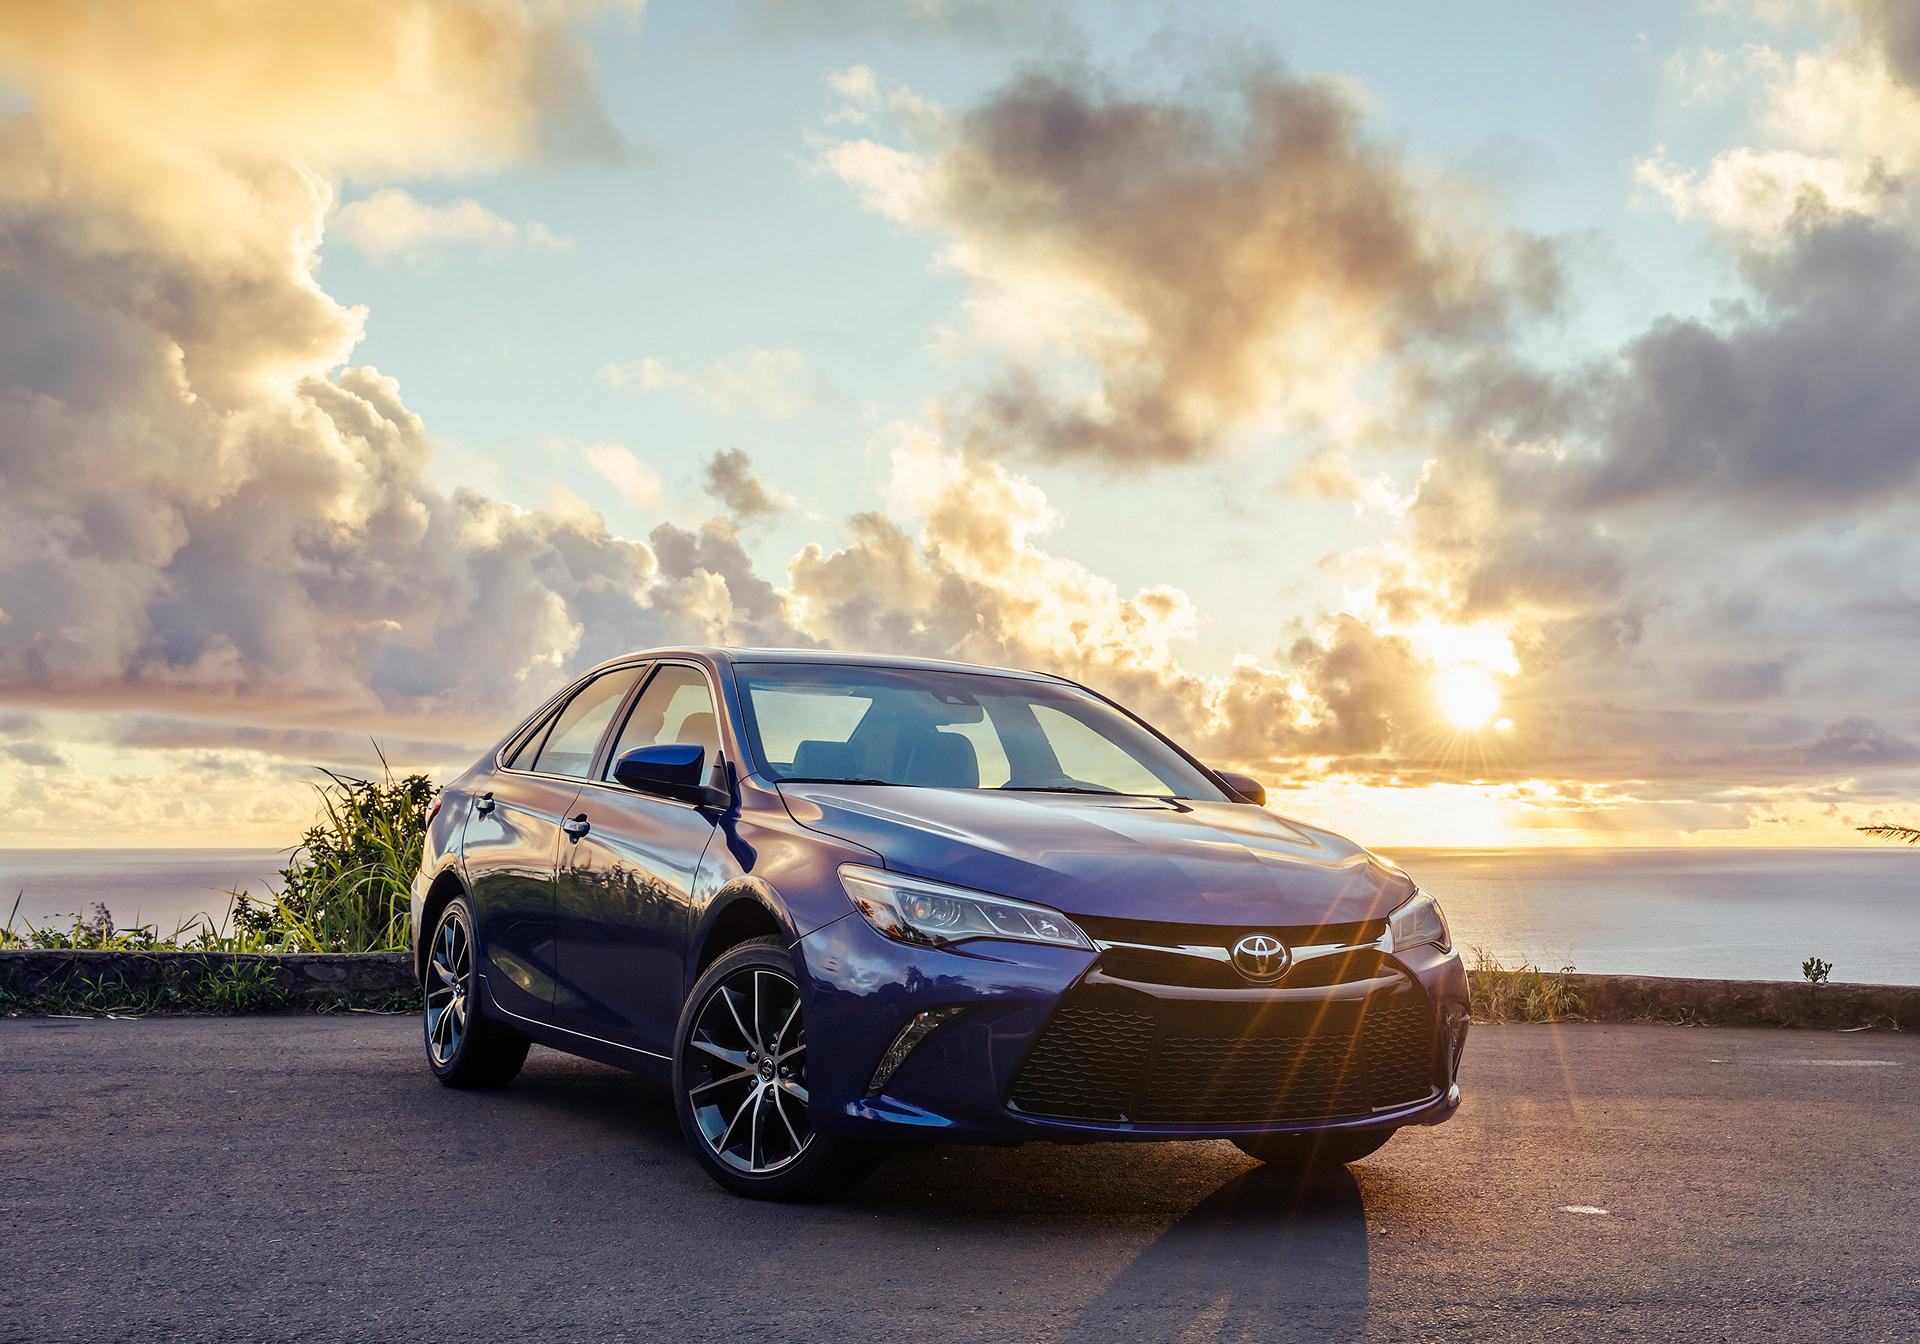 2017 Toyota Camry © Toyota Motor Corporation